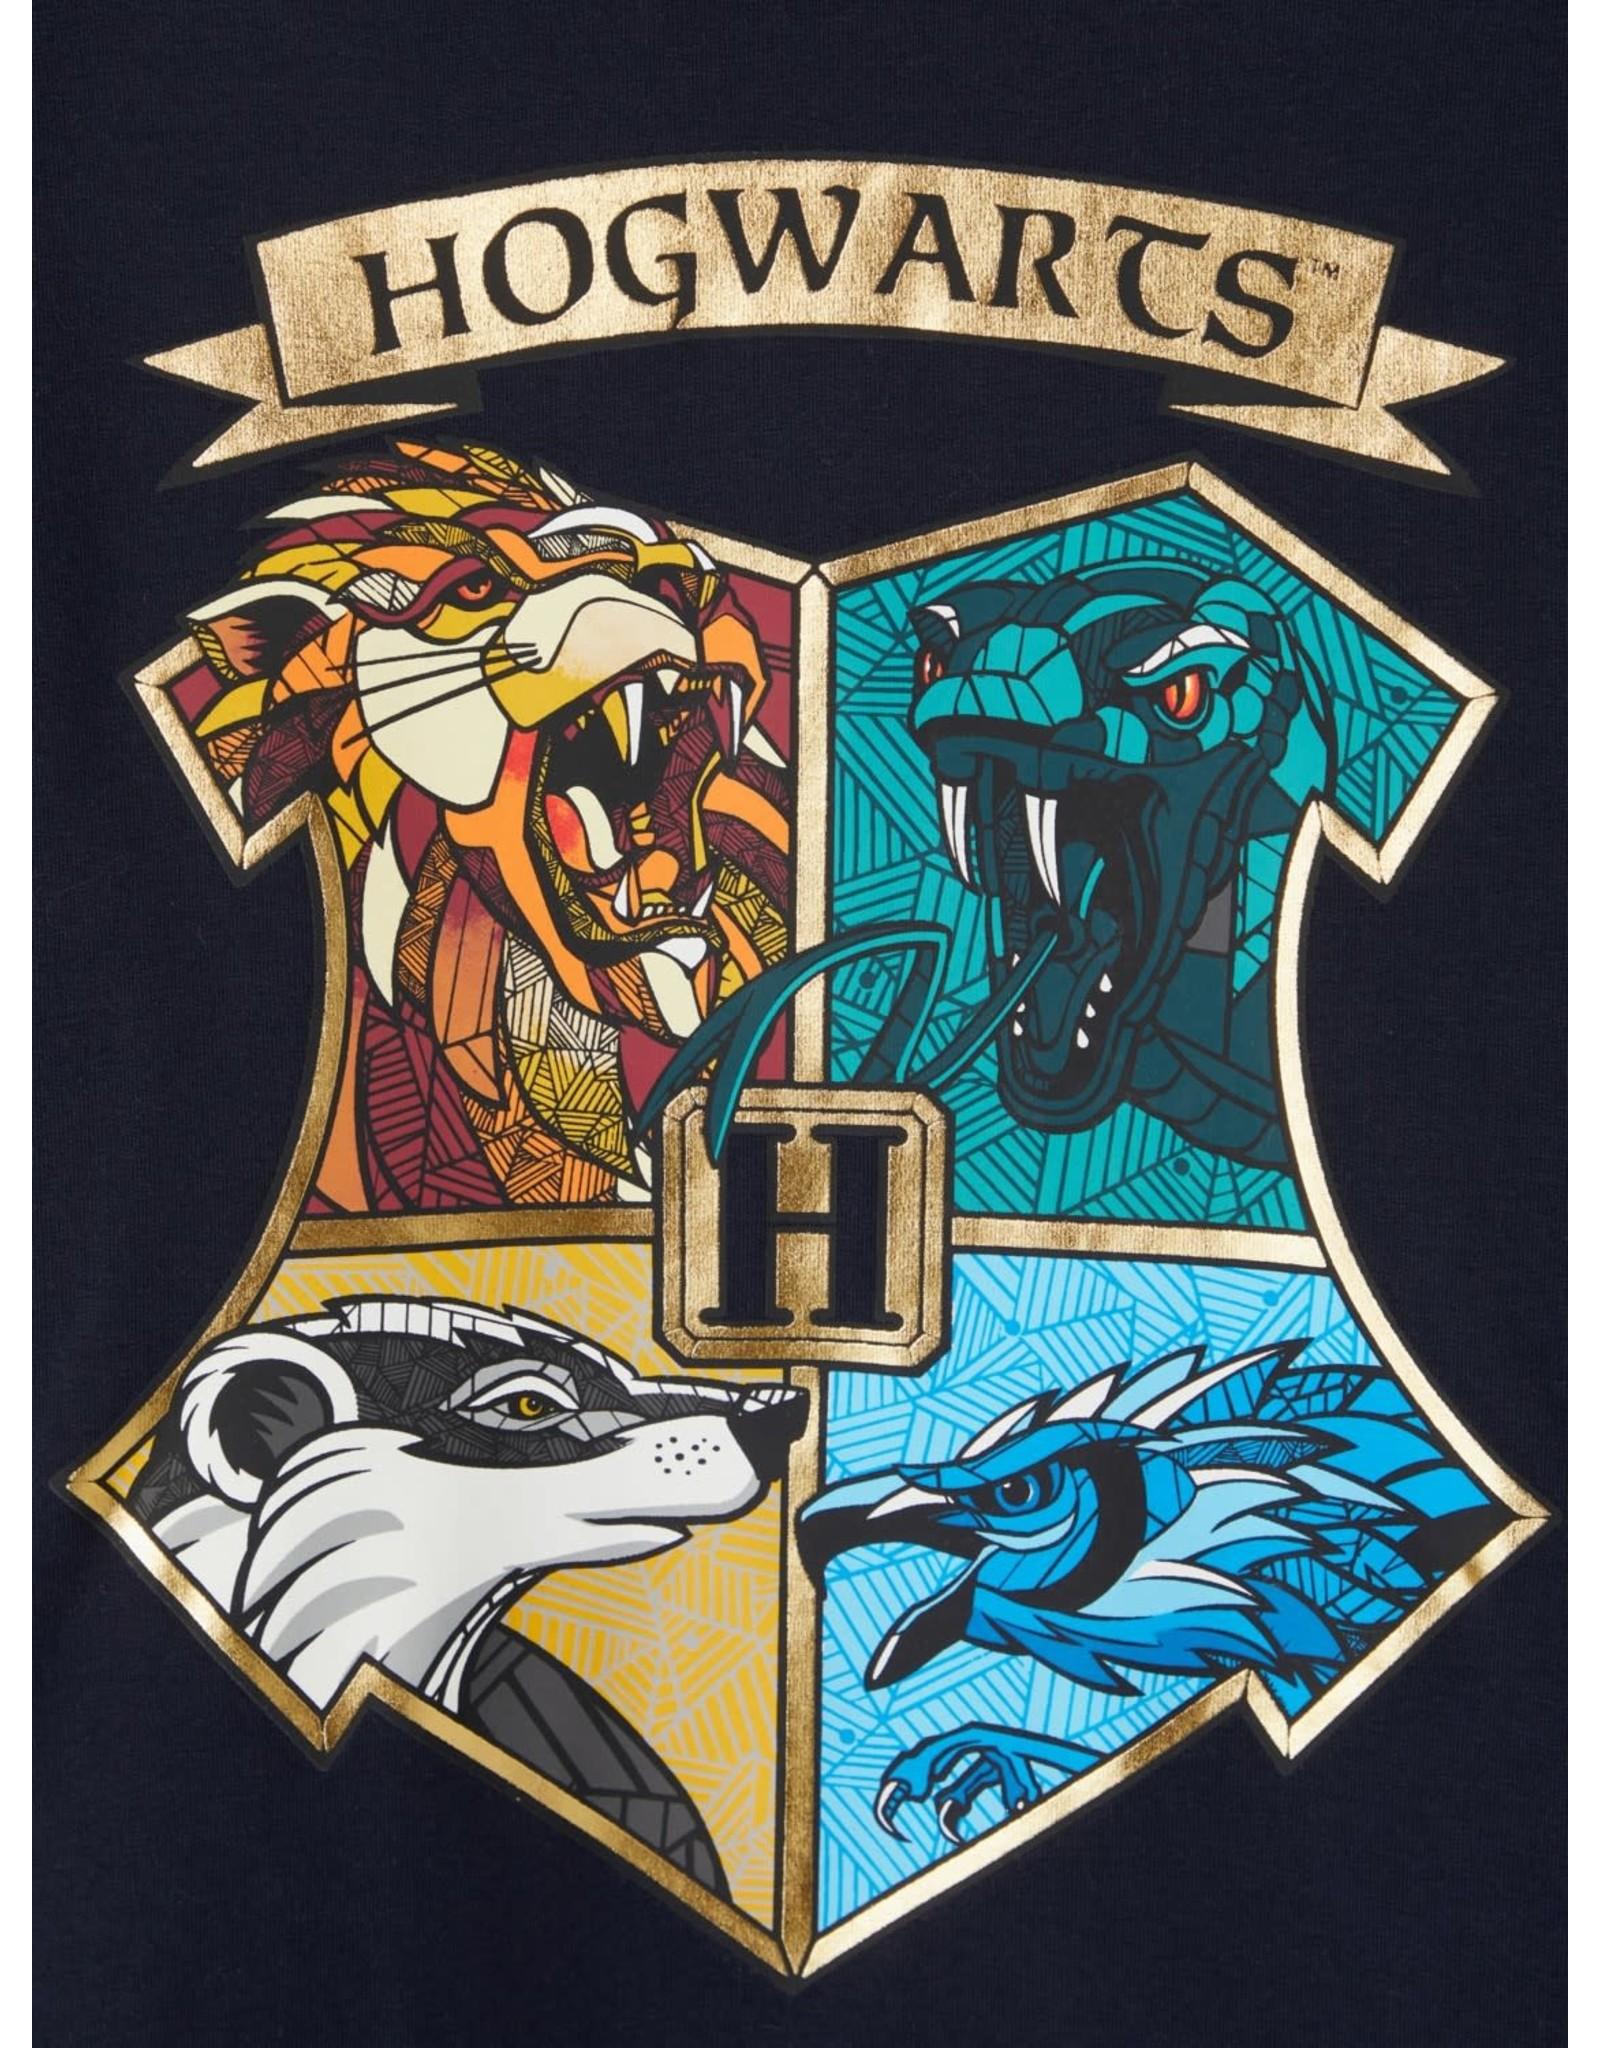 Name It Blauwe trui met Hogwarts logo van Harry Potter